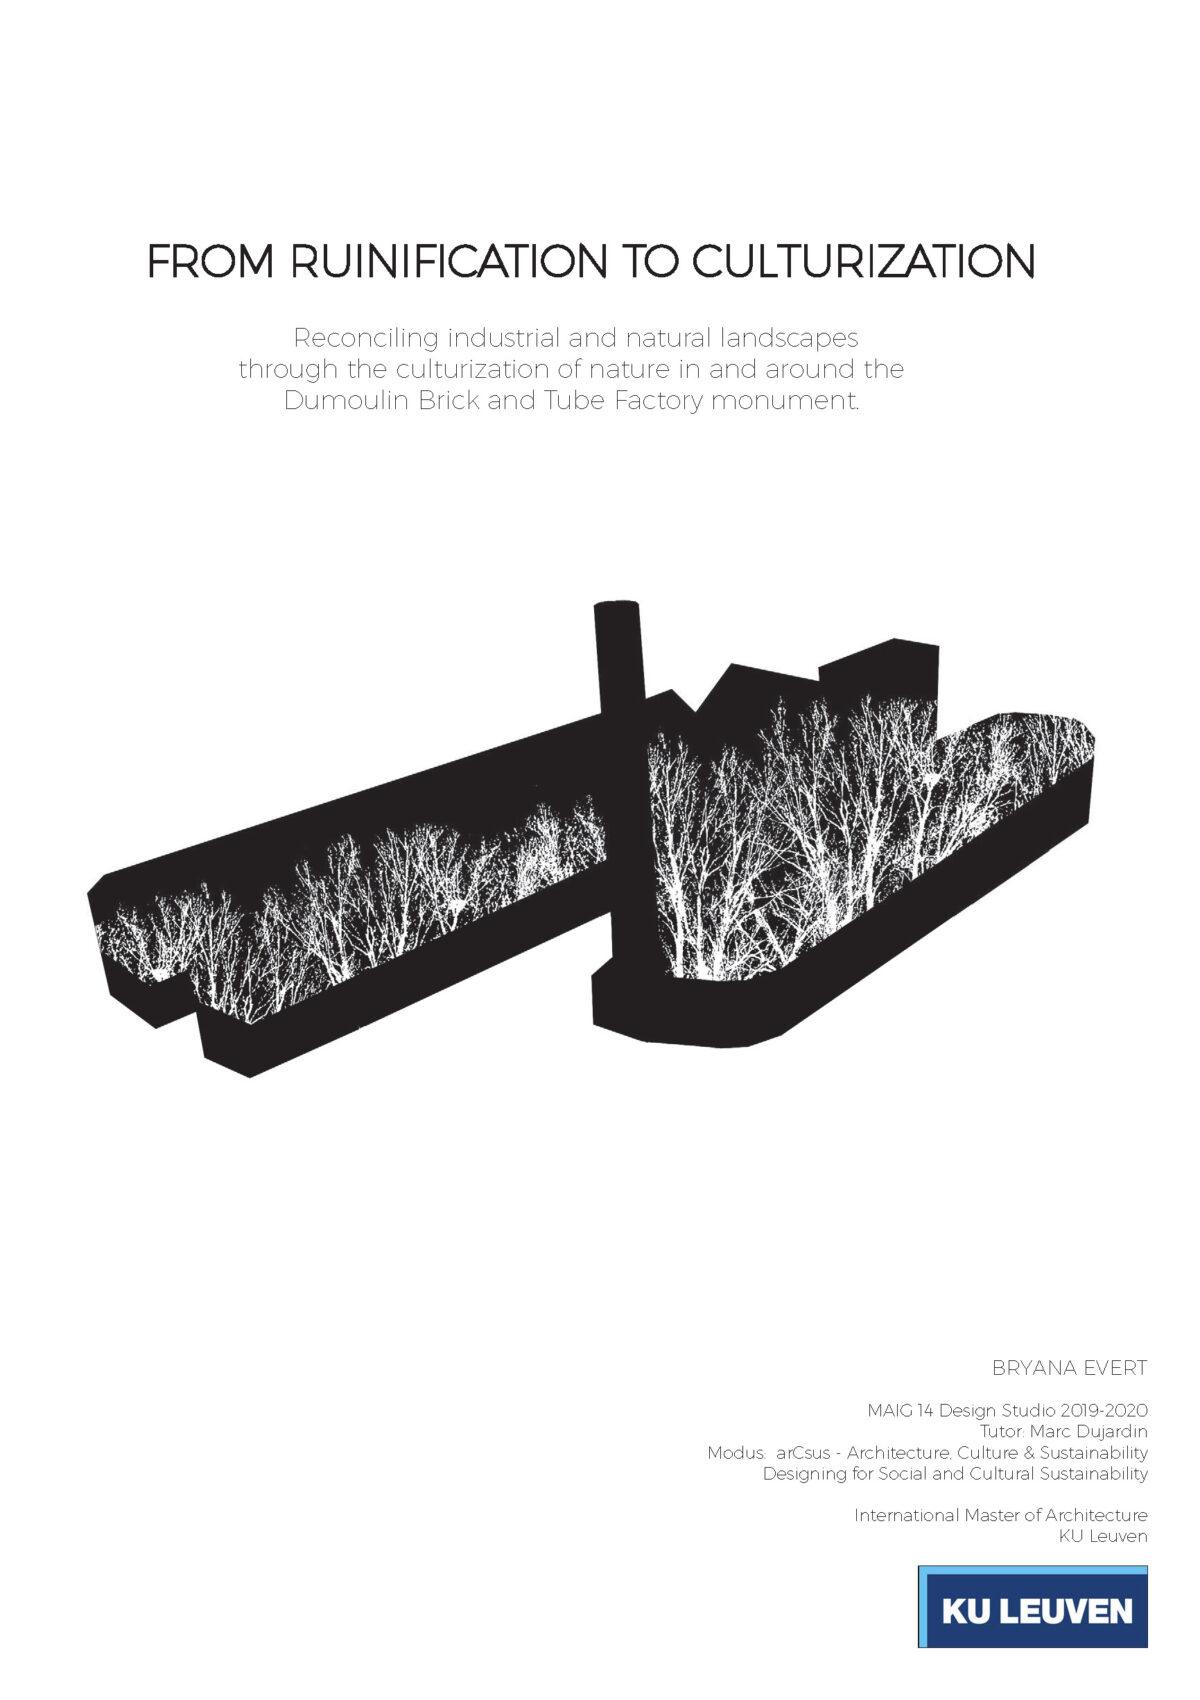 from-ruinification-to-culturizt-leporello-maig14-2019-2020-1